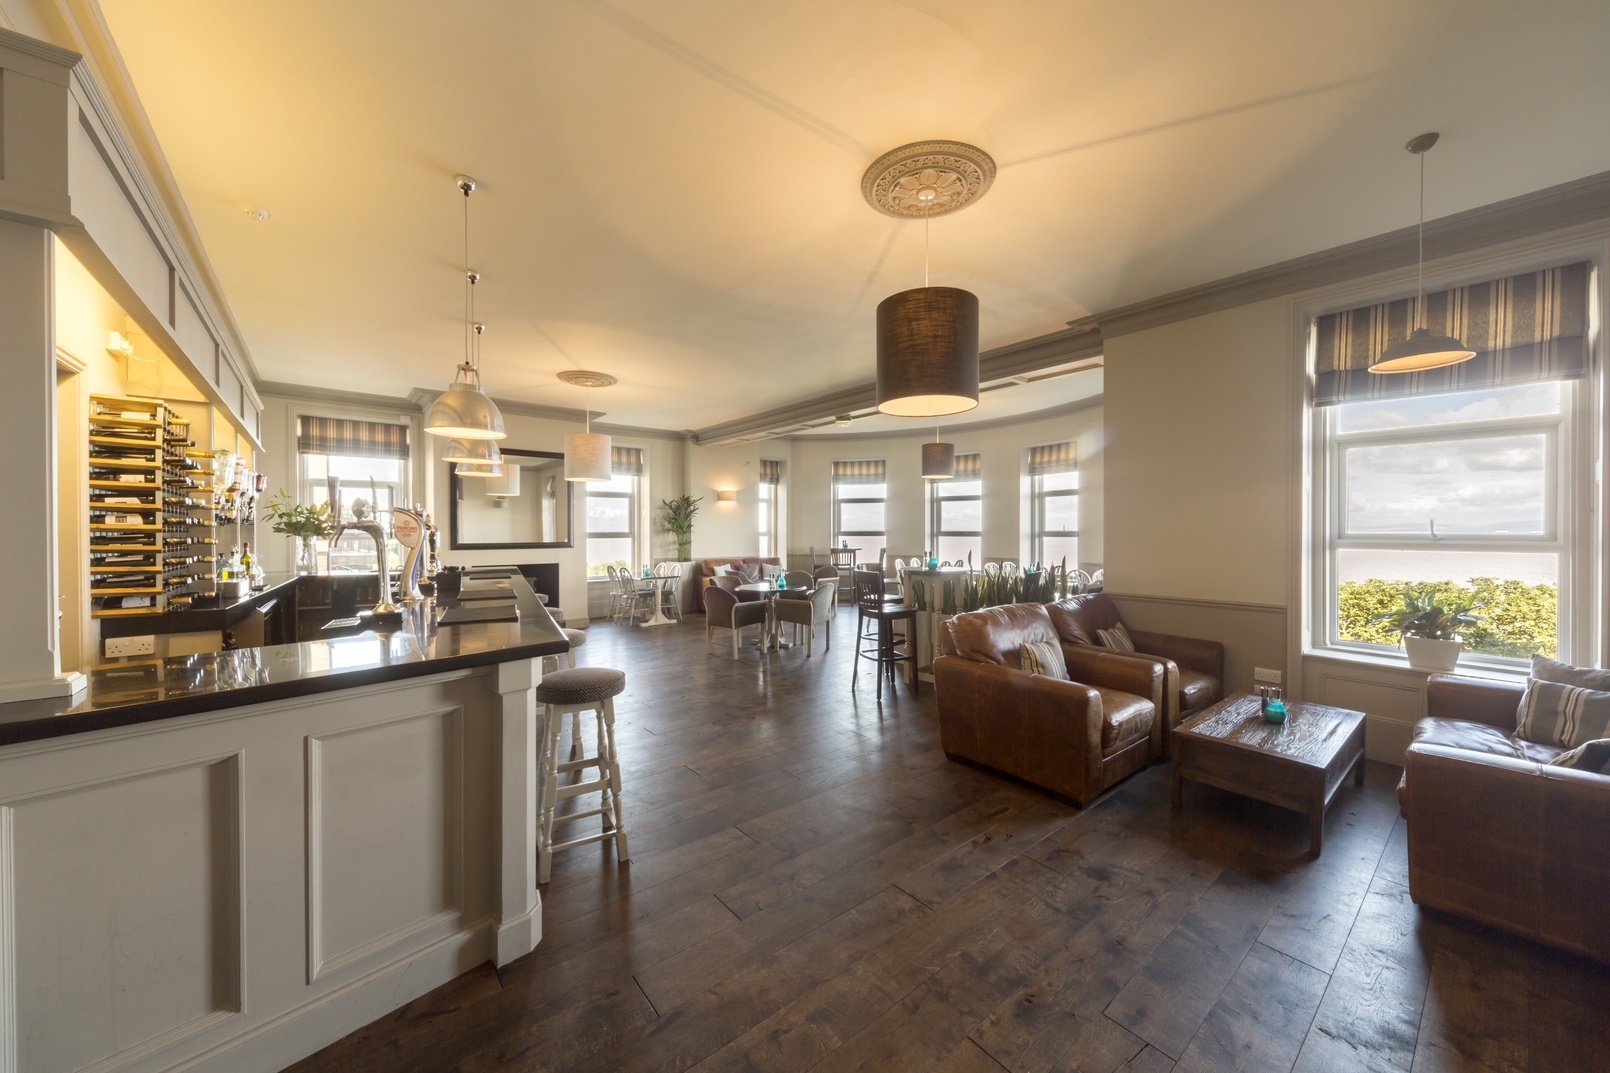 Best Western Park Hotel Clevedon